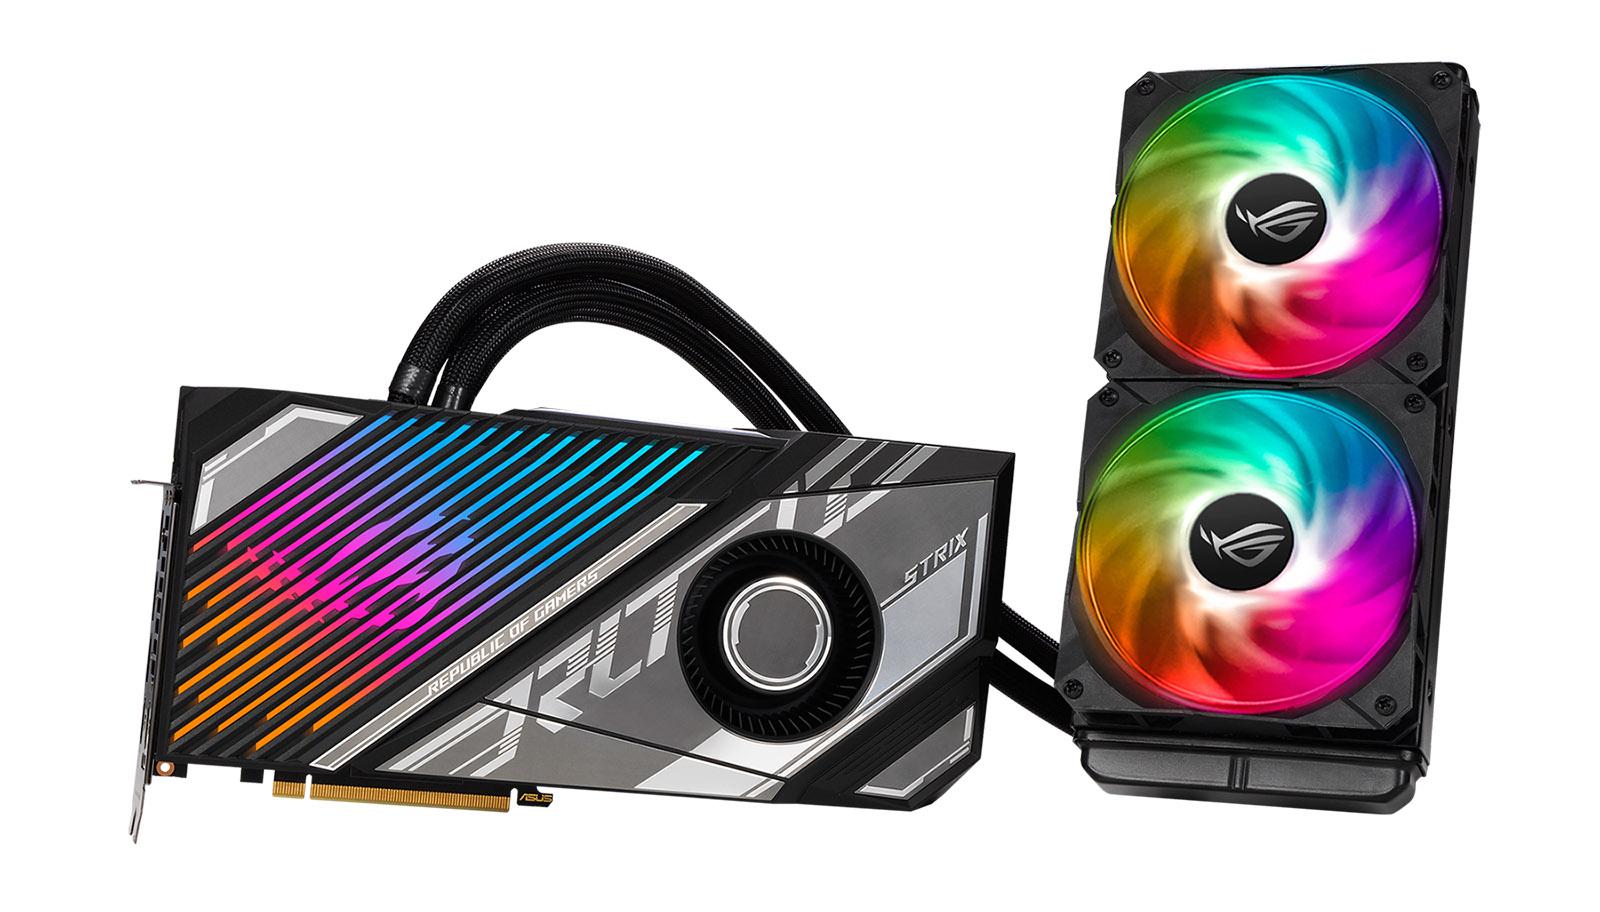 ROG Strix LC GeForce RTX 3080 Ti